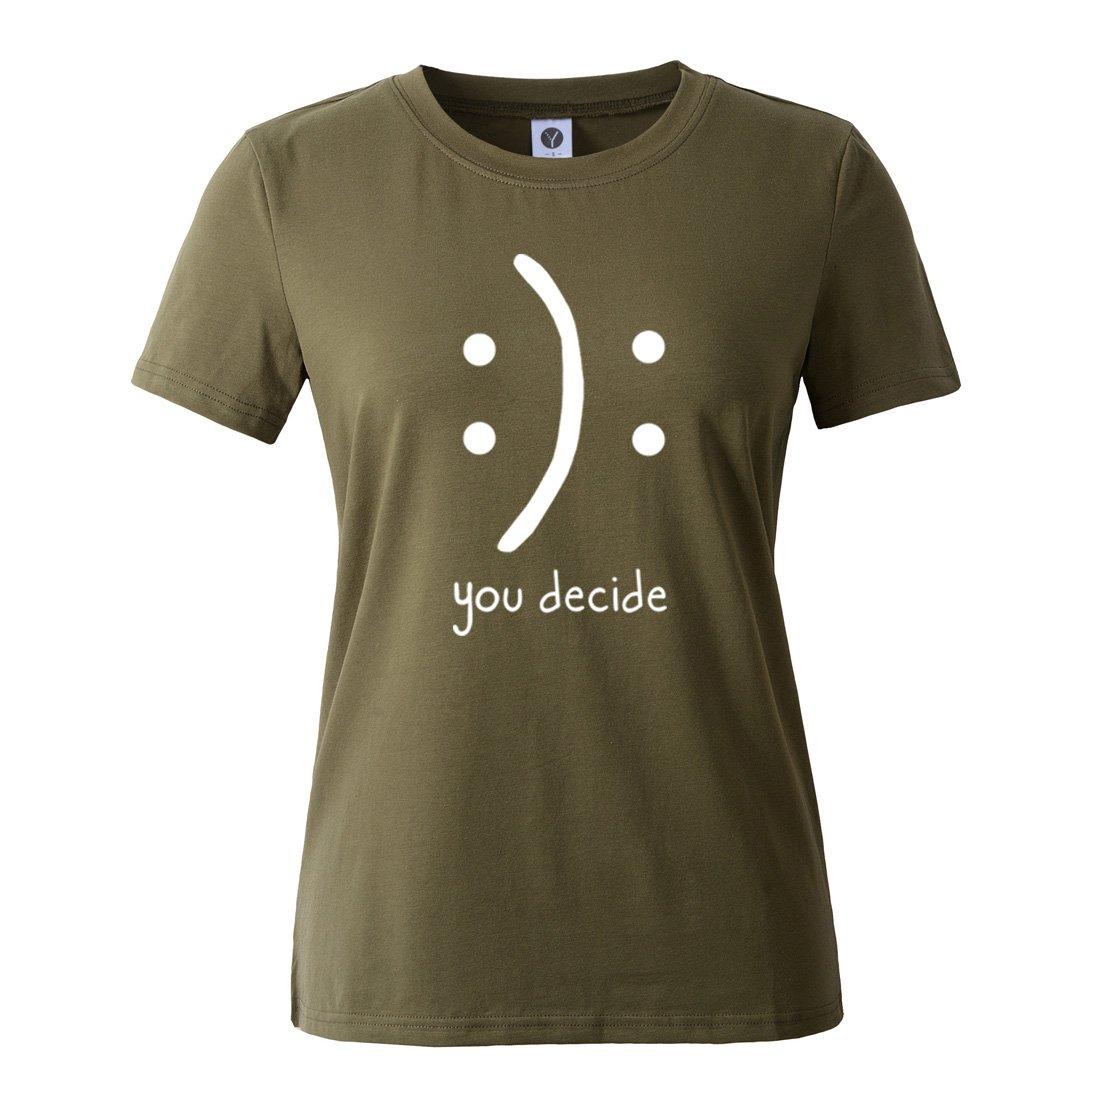 8ecff86695c Amazon.com: BLACKMYTH Women's T-Shirts Cotton Funny Grahpic Design Casual  Short Sleeve Top Tees: Clothing